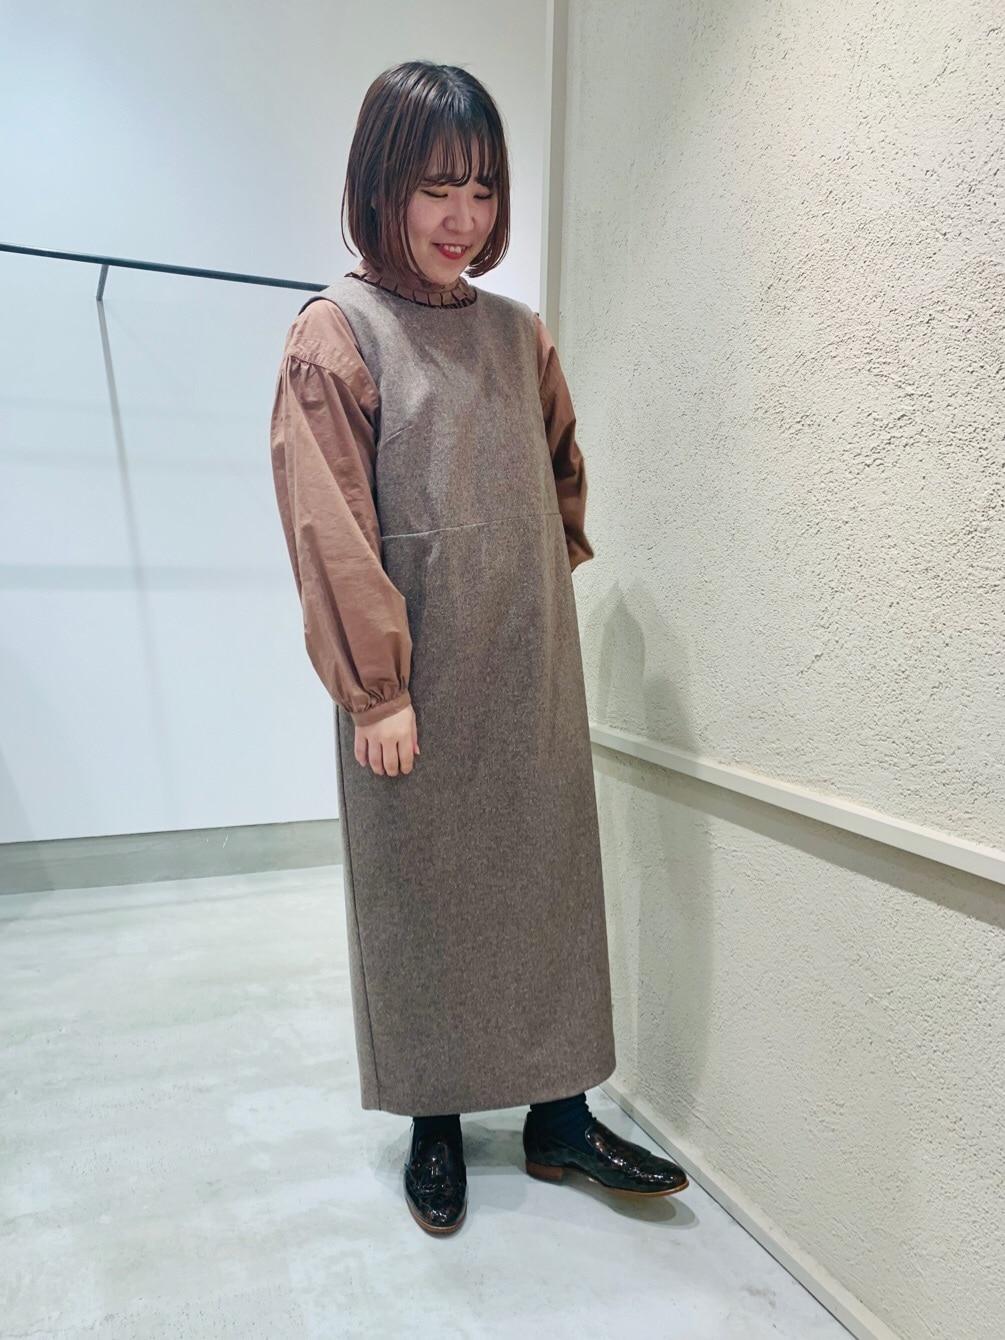 chambre de charme 横浜ジョイナス 身長:155cm 2020.11.14